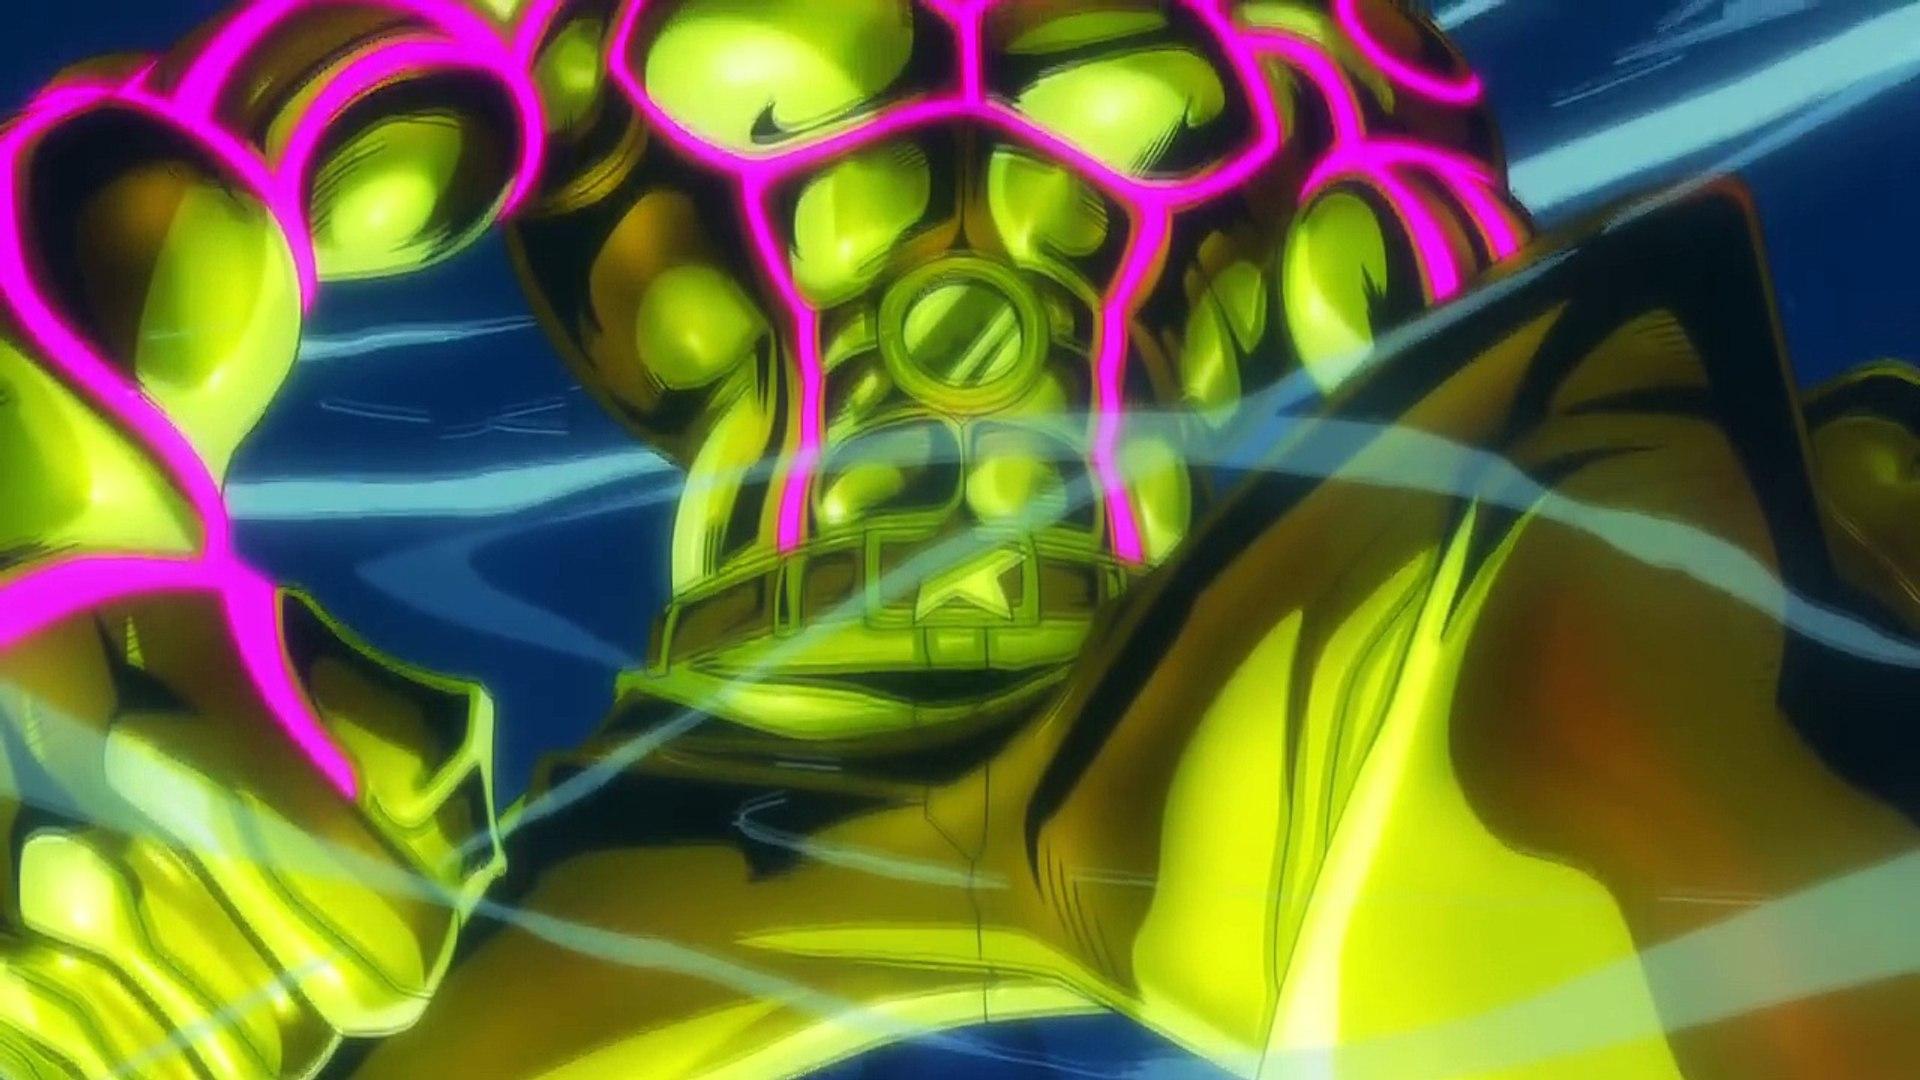 One Piece Wallpaper: One Piece Episode Luffy Vs Tesoro